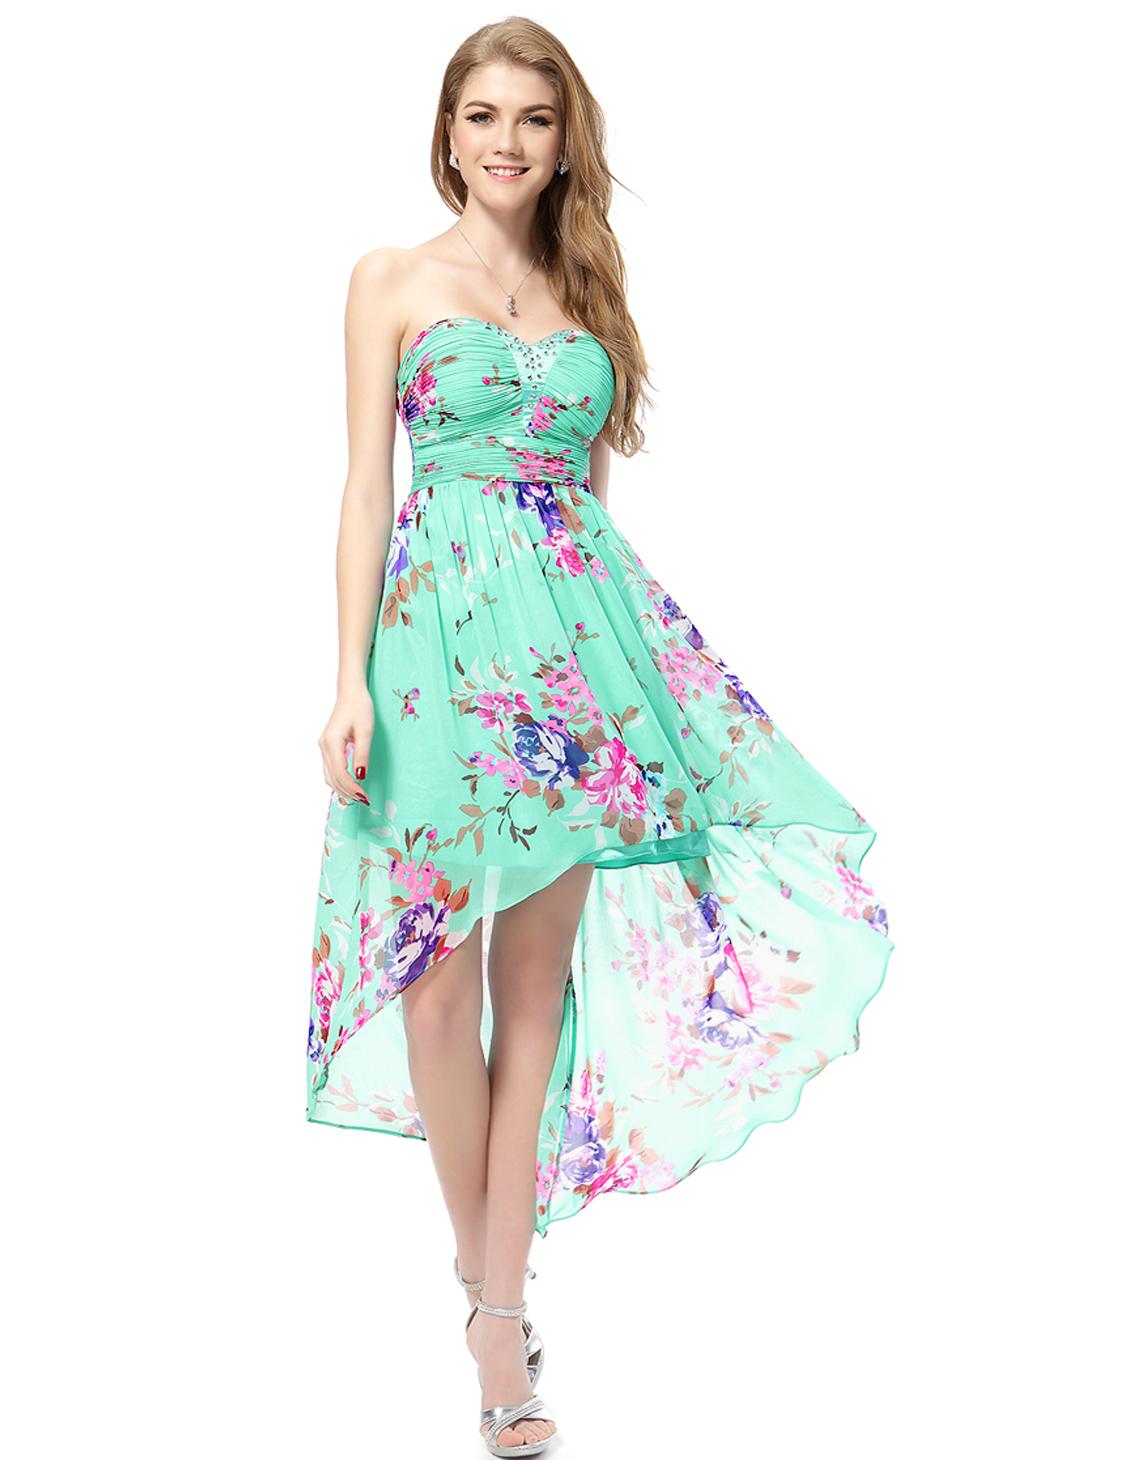 Sweetheart Neckline Summer Dresses